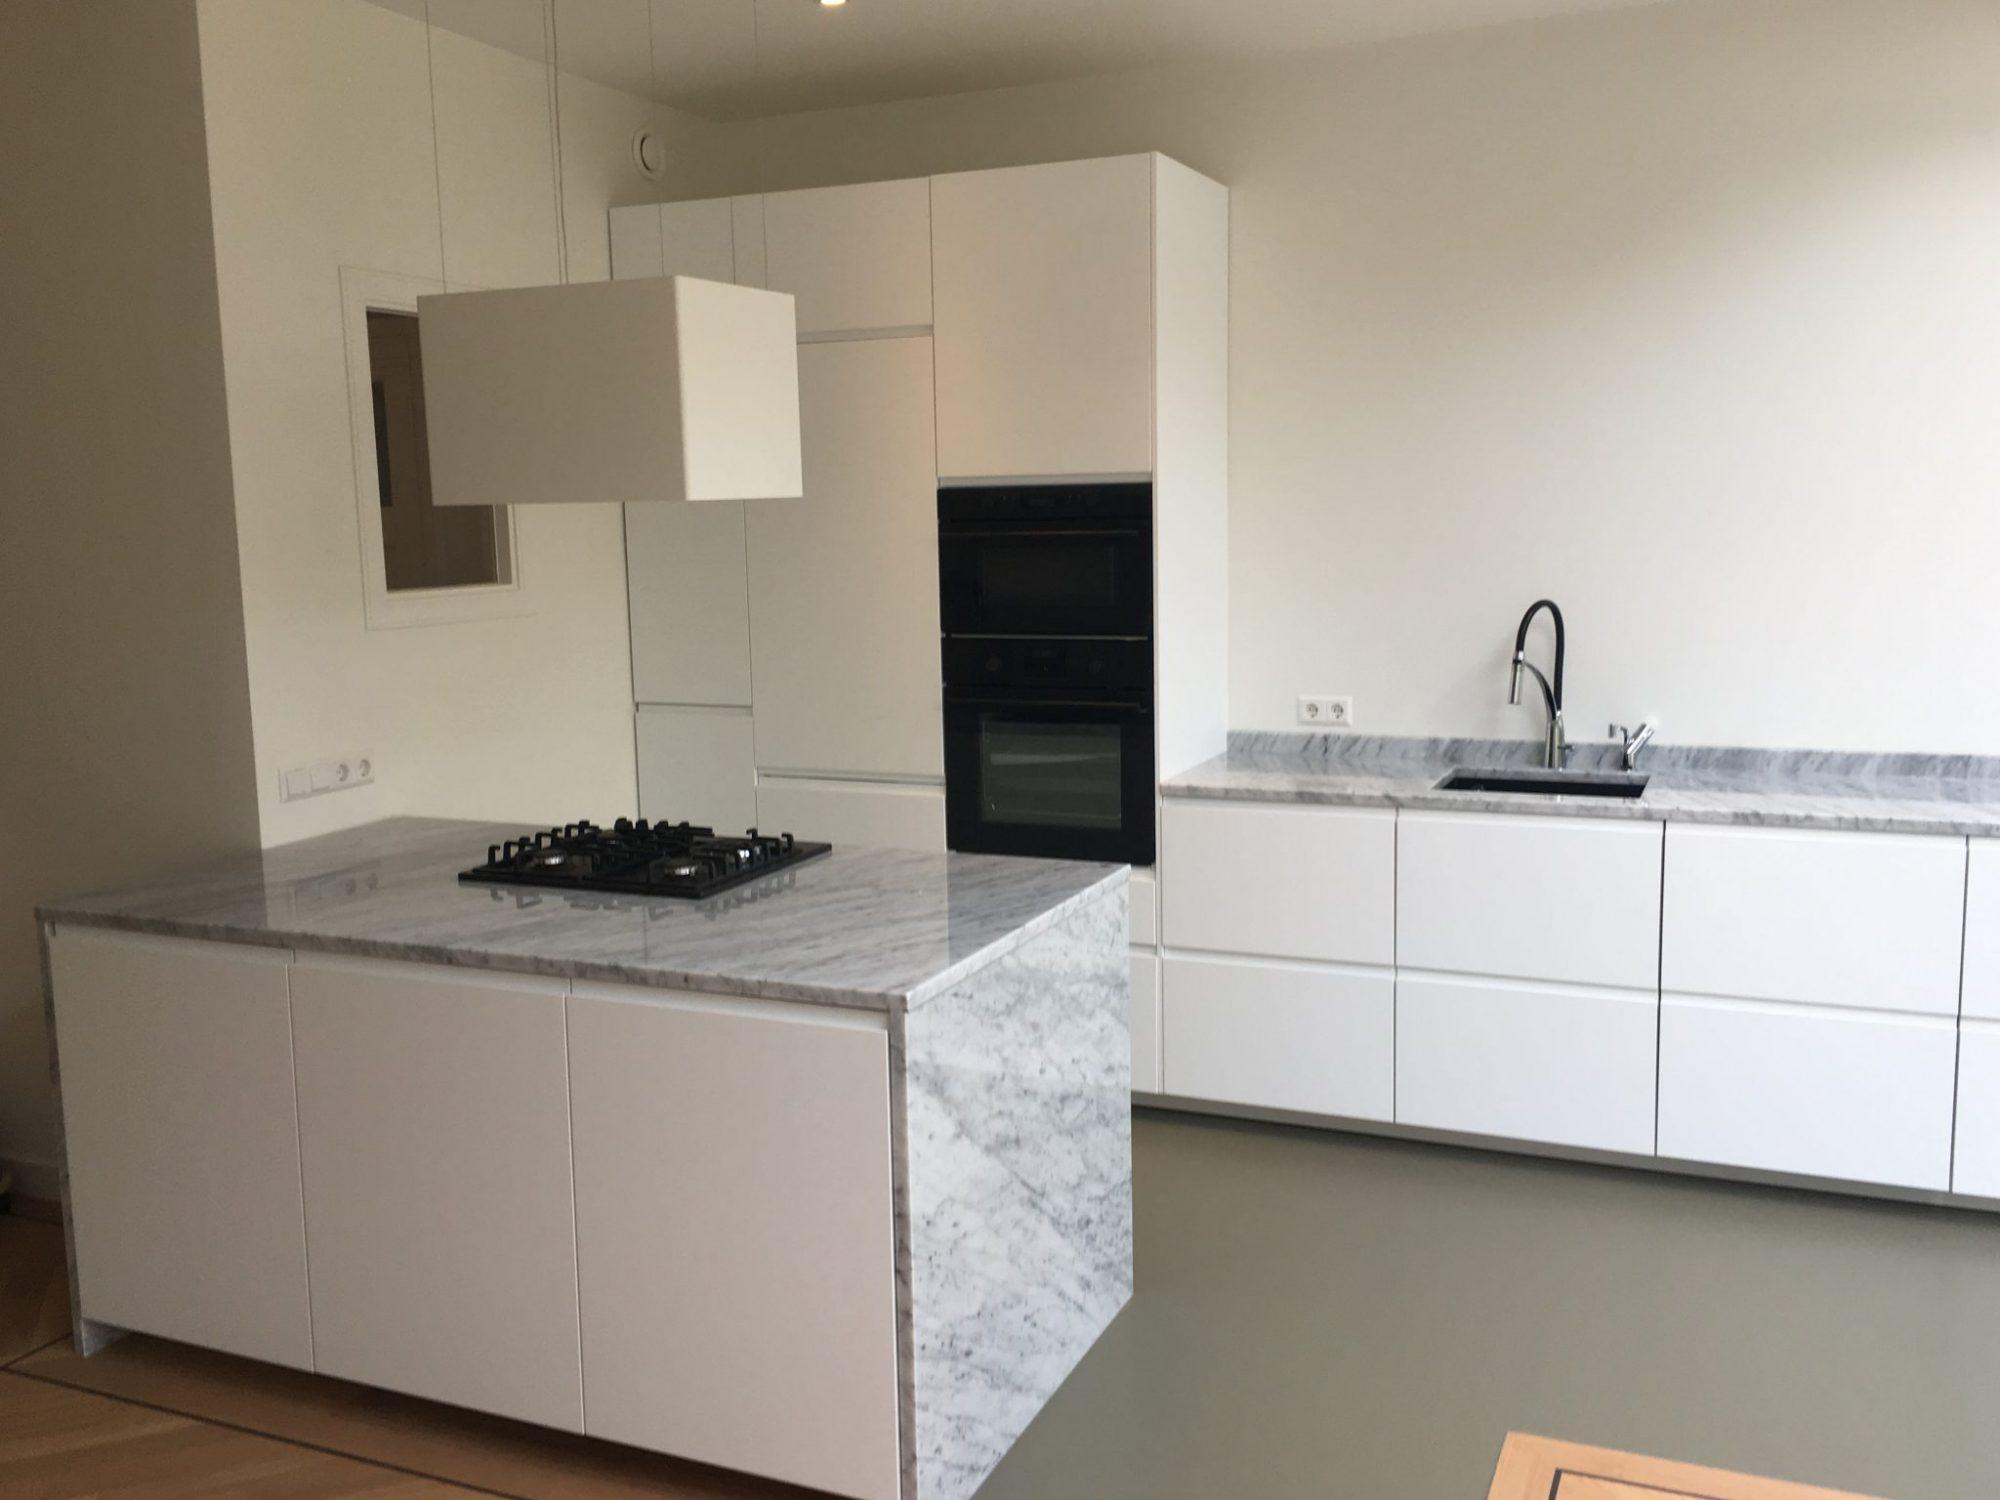 IKEA Keukenmontage – Rotterdam Hillegersberg